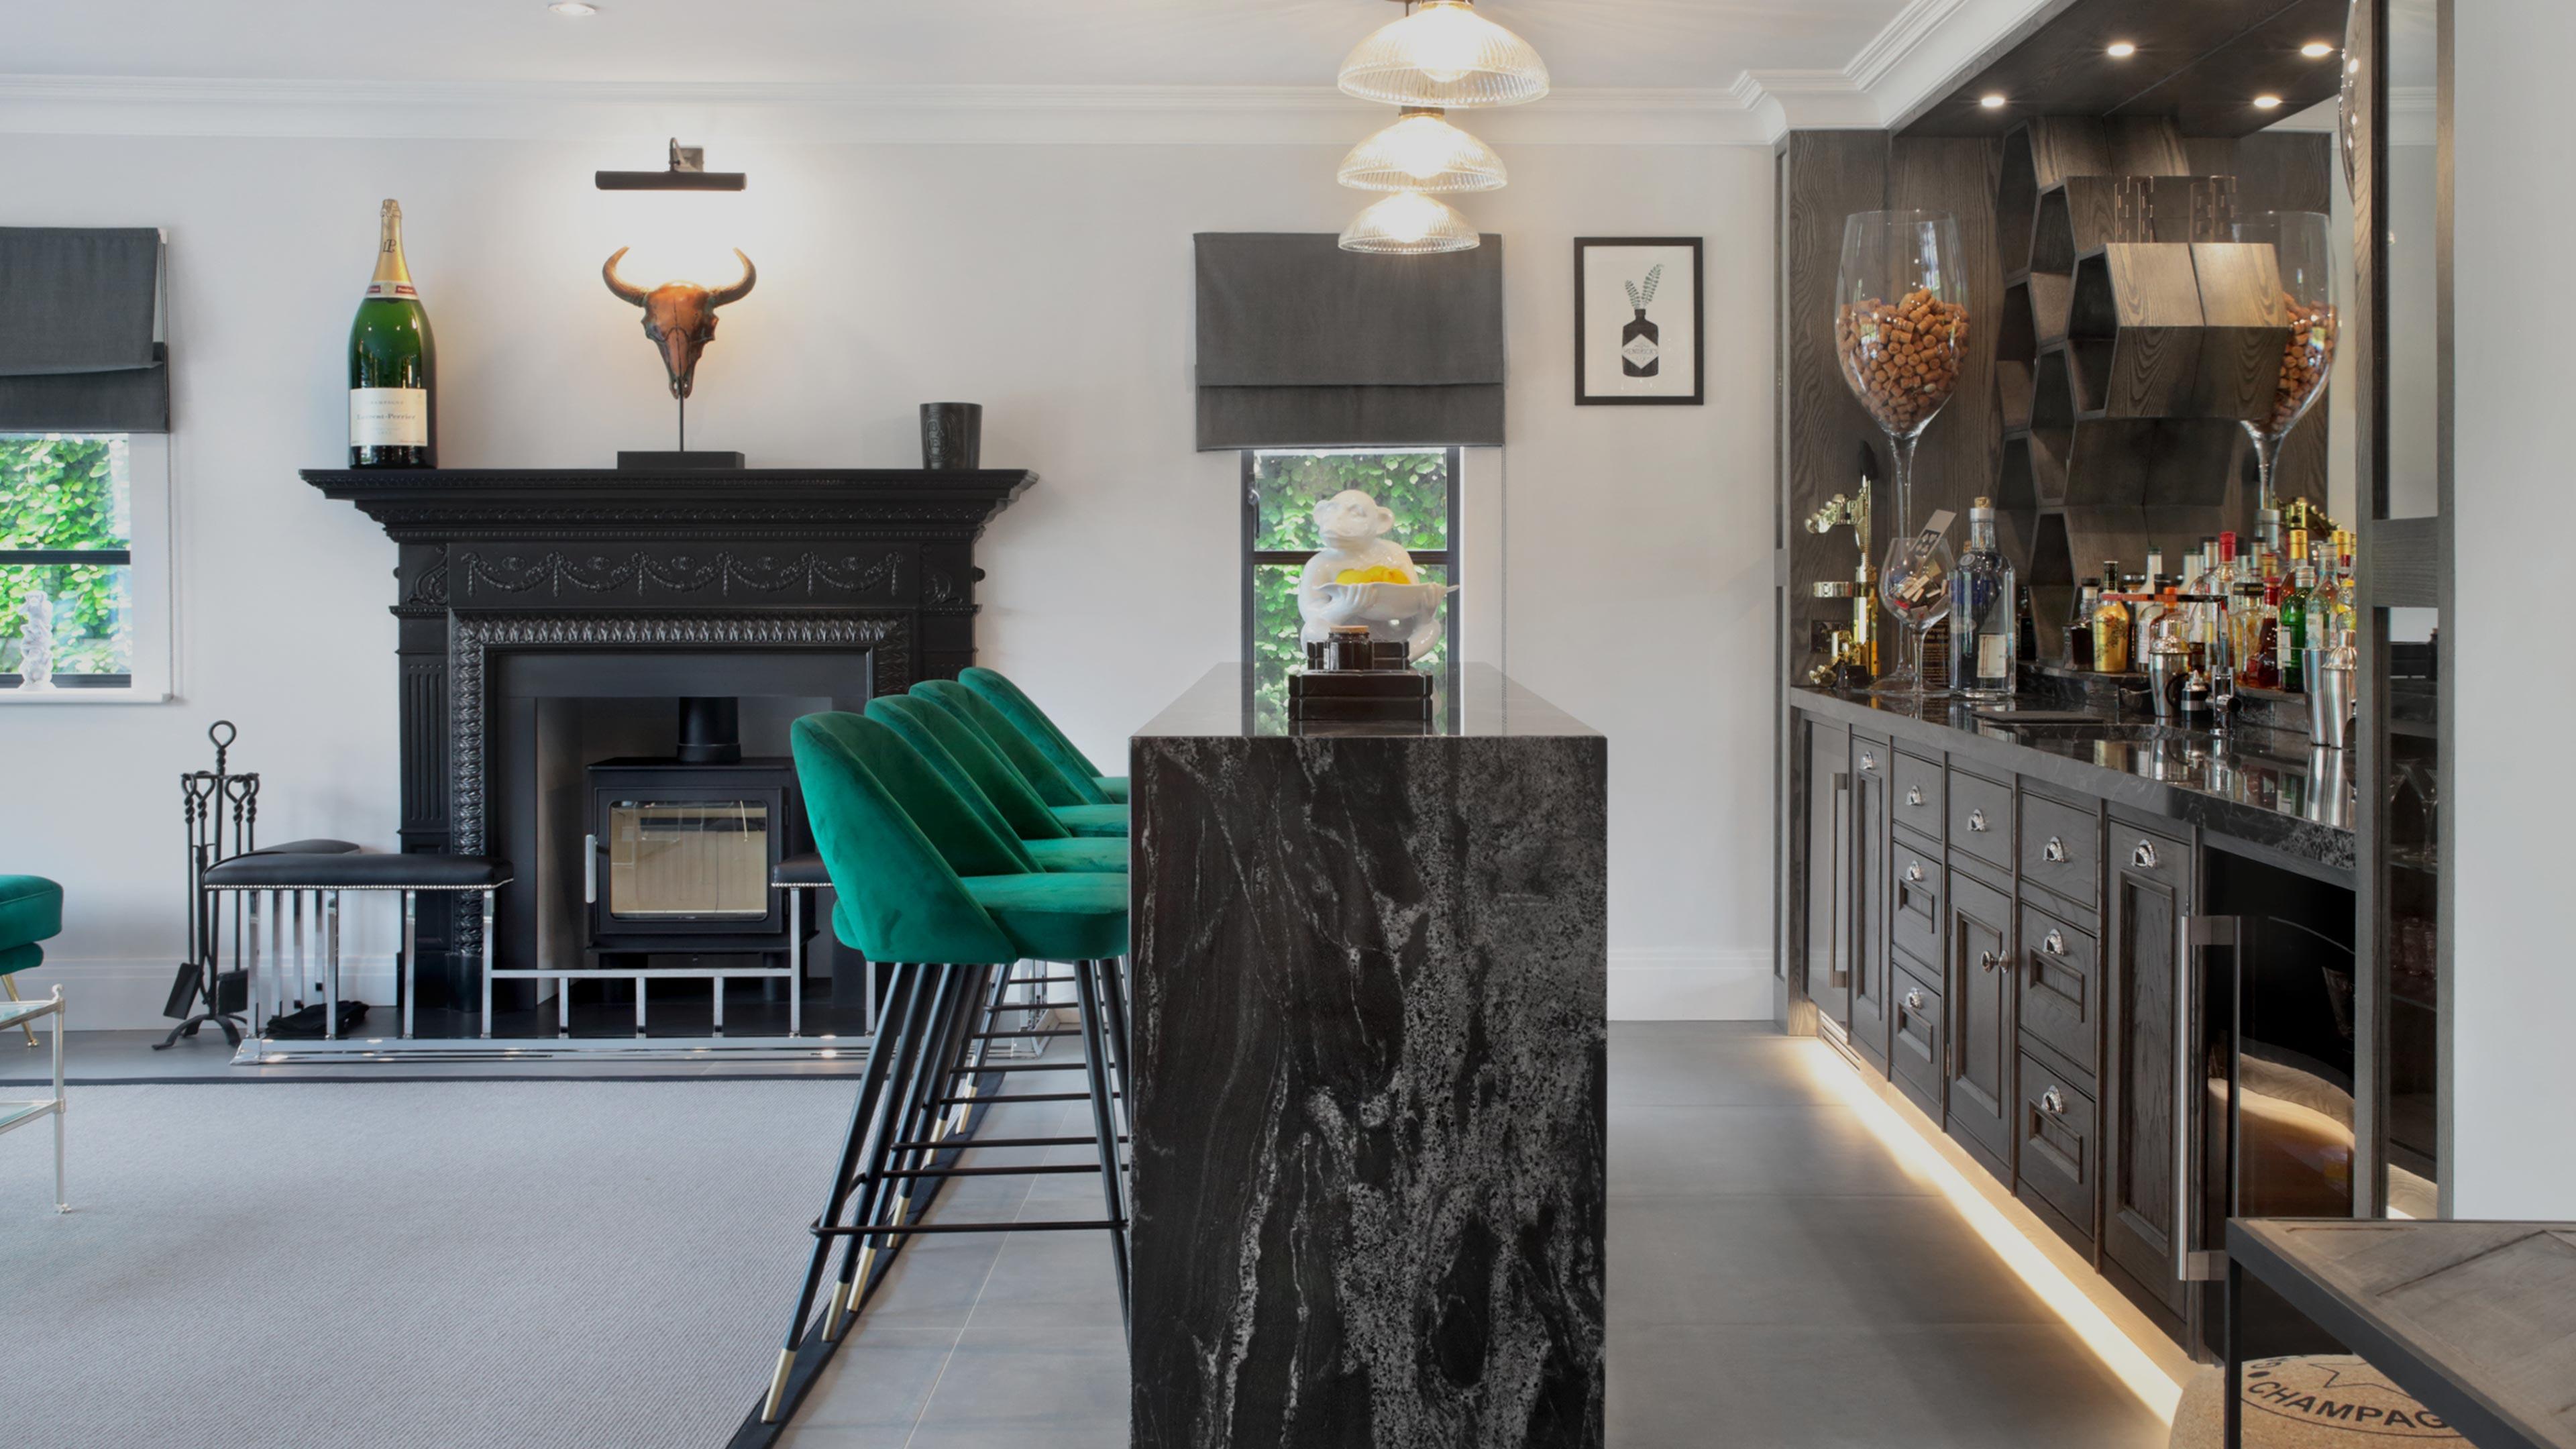 Bespoke Kitchens   Luxury Kitchens   Bespoke Furniture With Regard To 2017 Giles 3 Piece Dining Sets (Image 2 of 20)